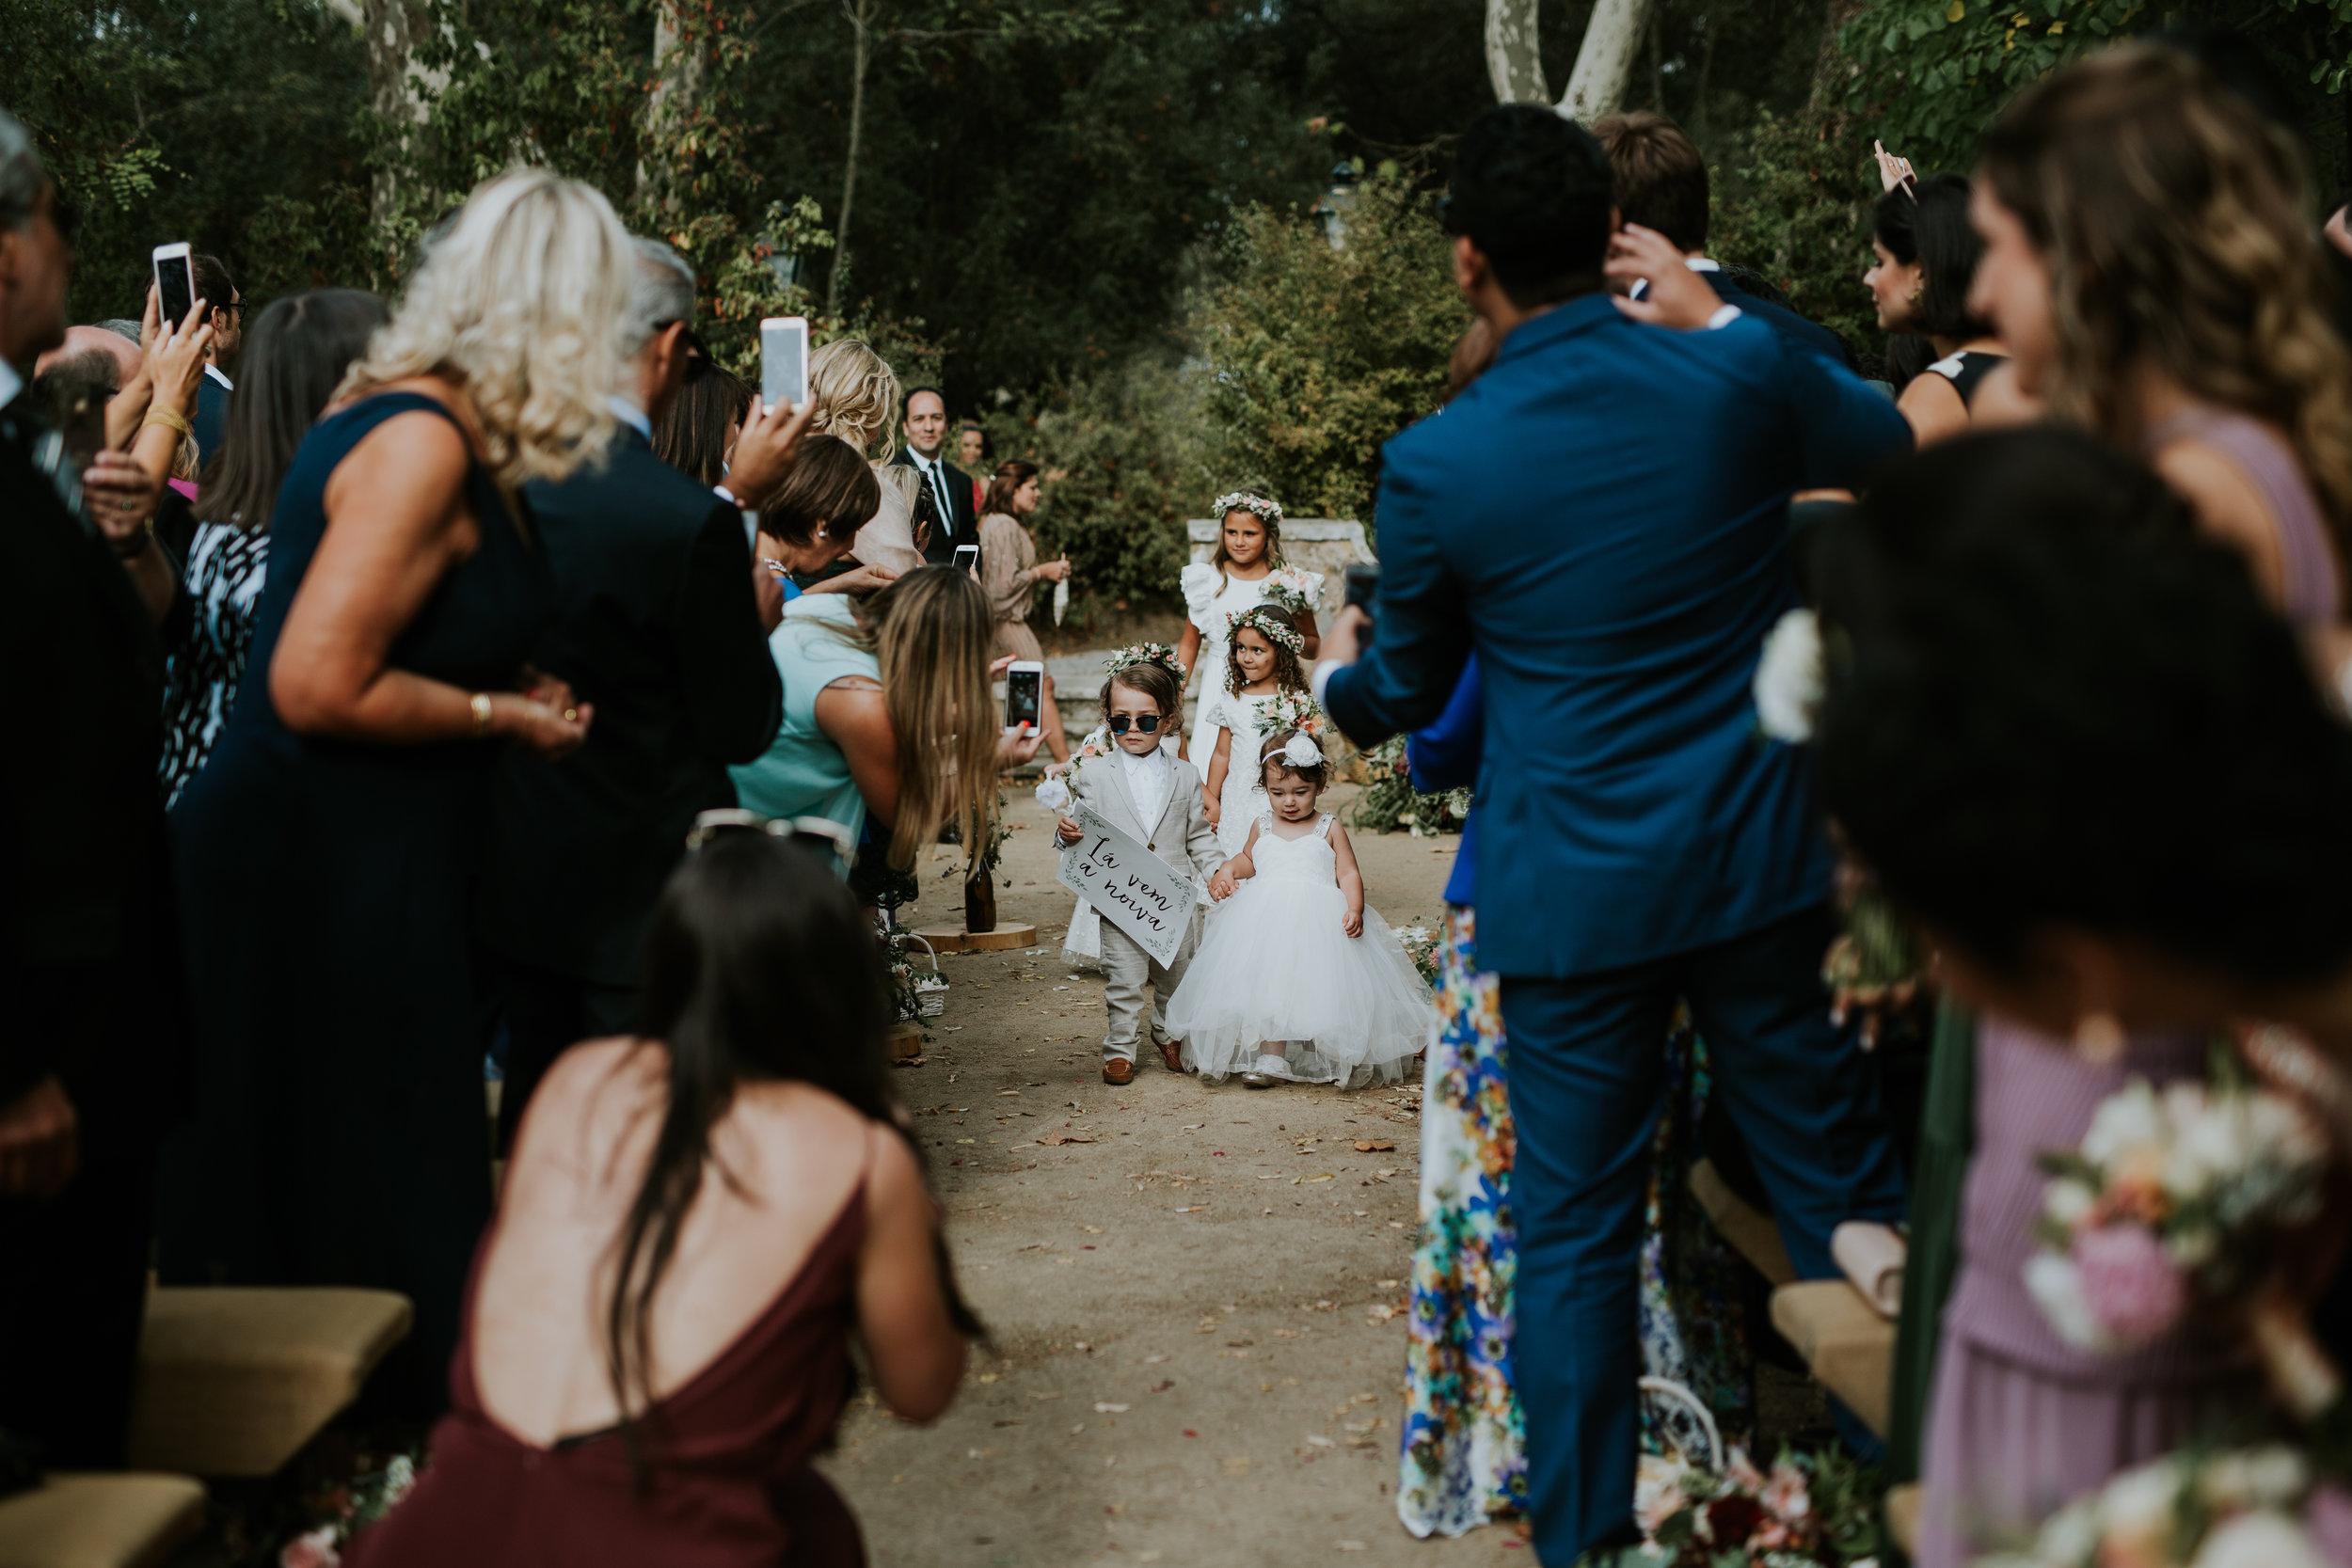 R&J199_ 09 setembro 2017 Wedding day_.jpg